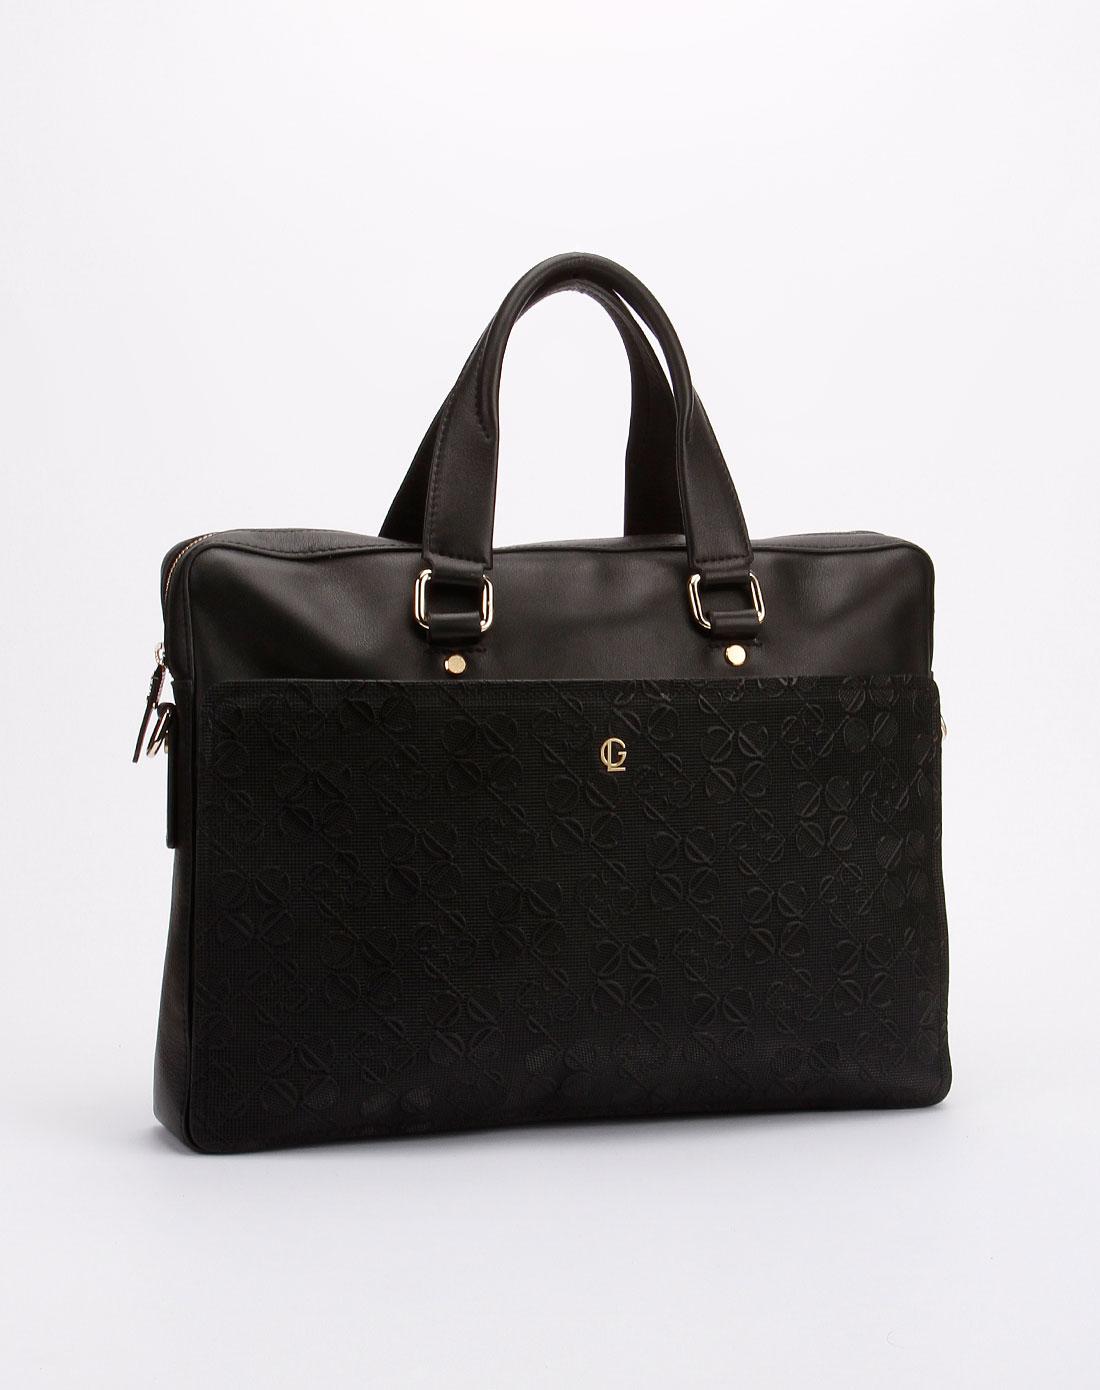 laroche箱包男女男款黑色手提包gm1820001